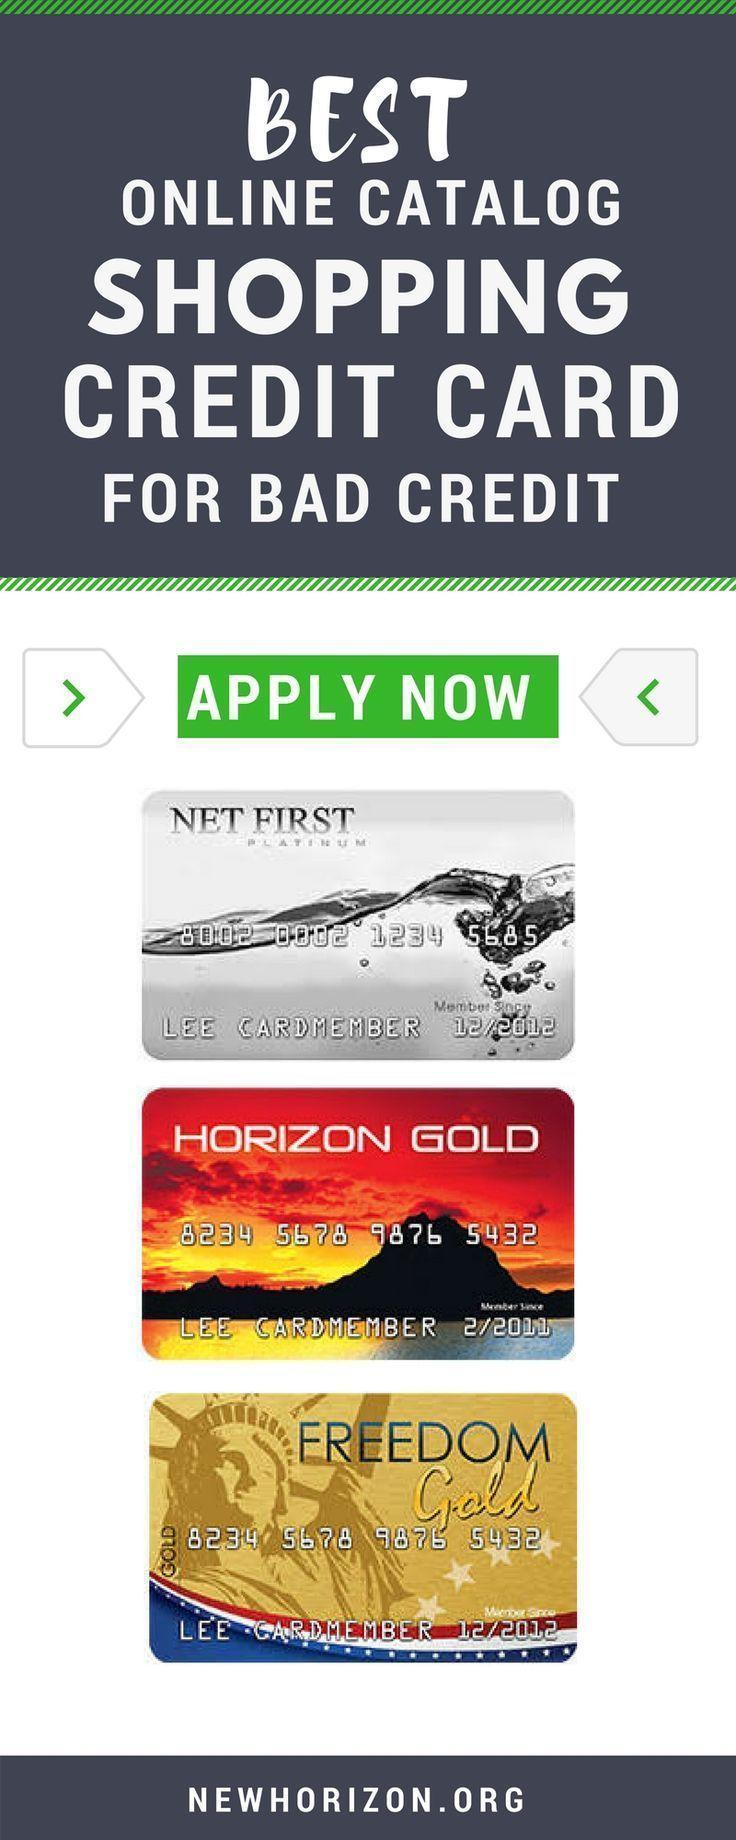 Credit Card Picture Credit Card Picture Kreditkarte Credit Card